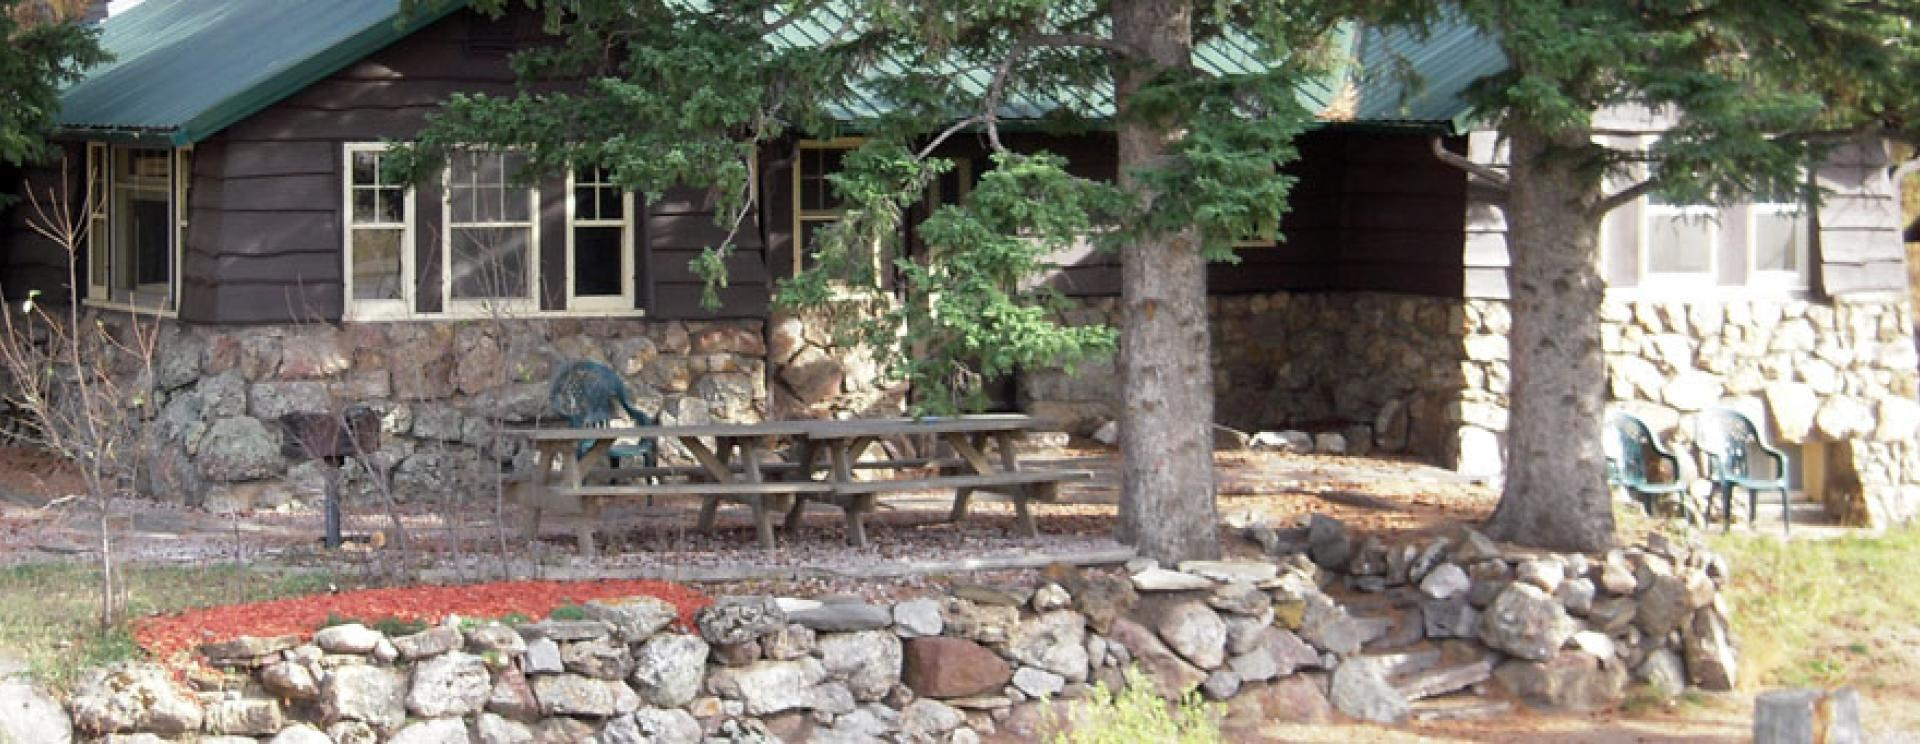 Calamity Peak Lodge & Cabins